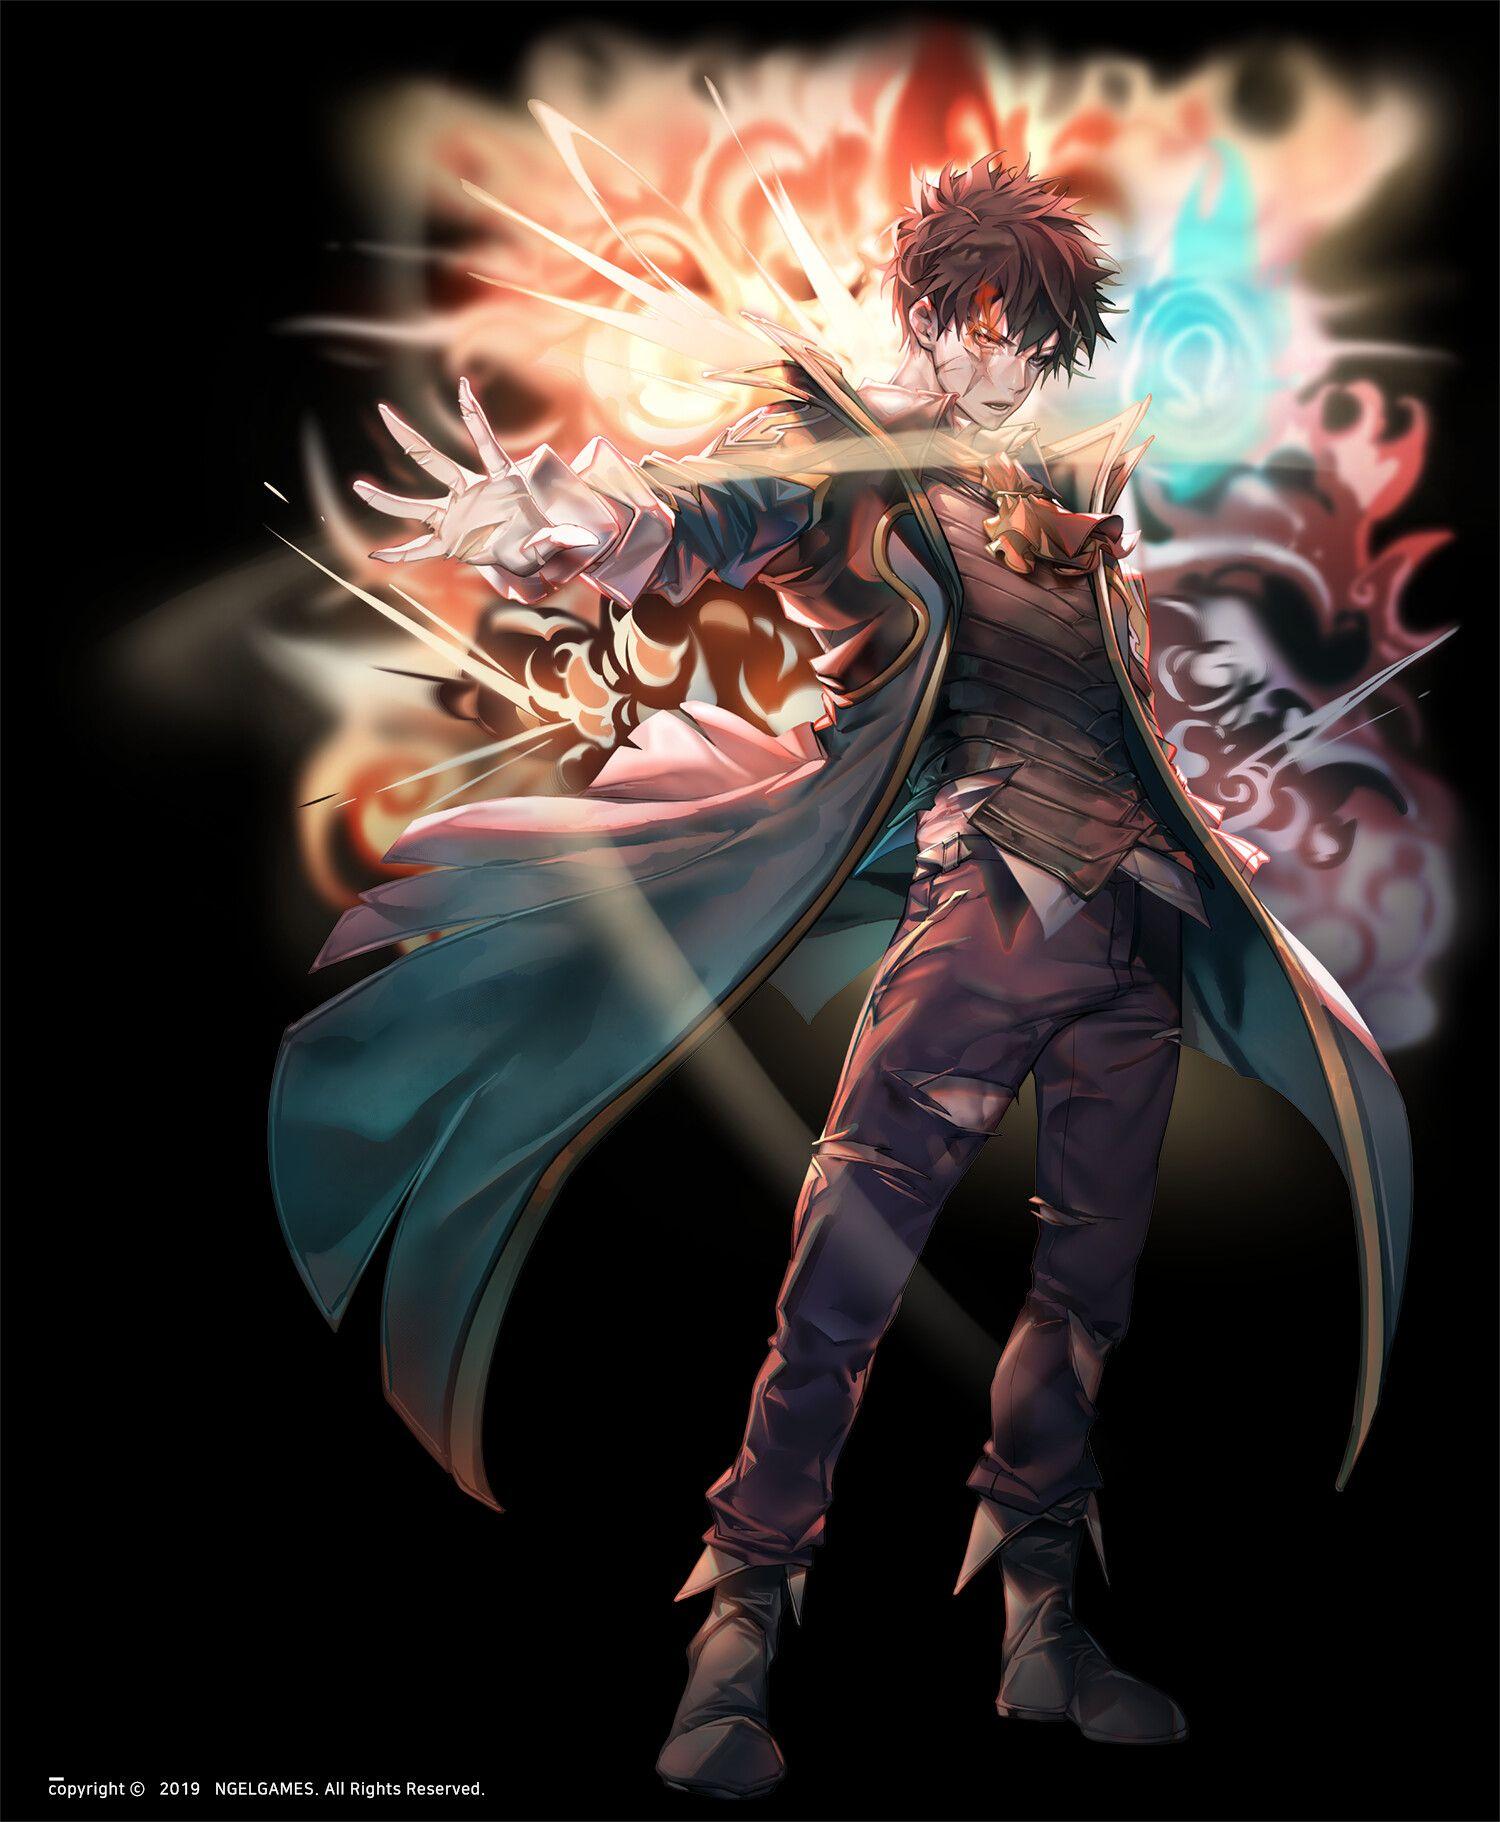 ArtStation herocantare artwork_Jade Emperor HanDaeWi